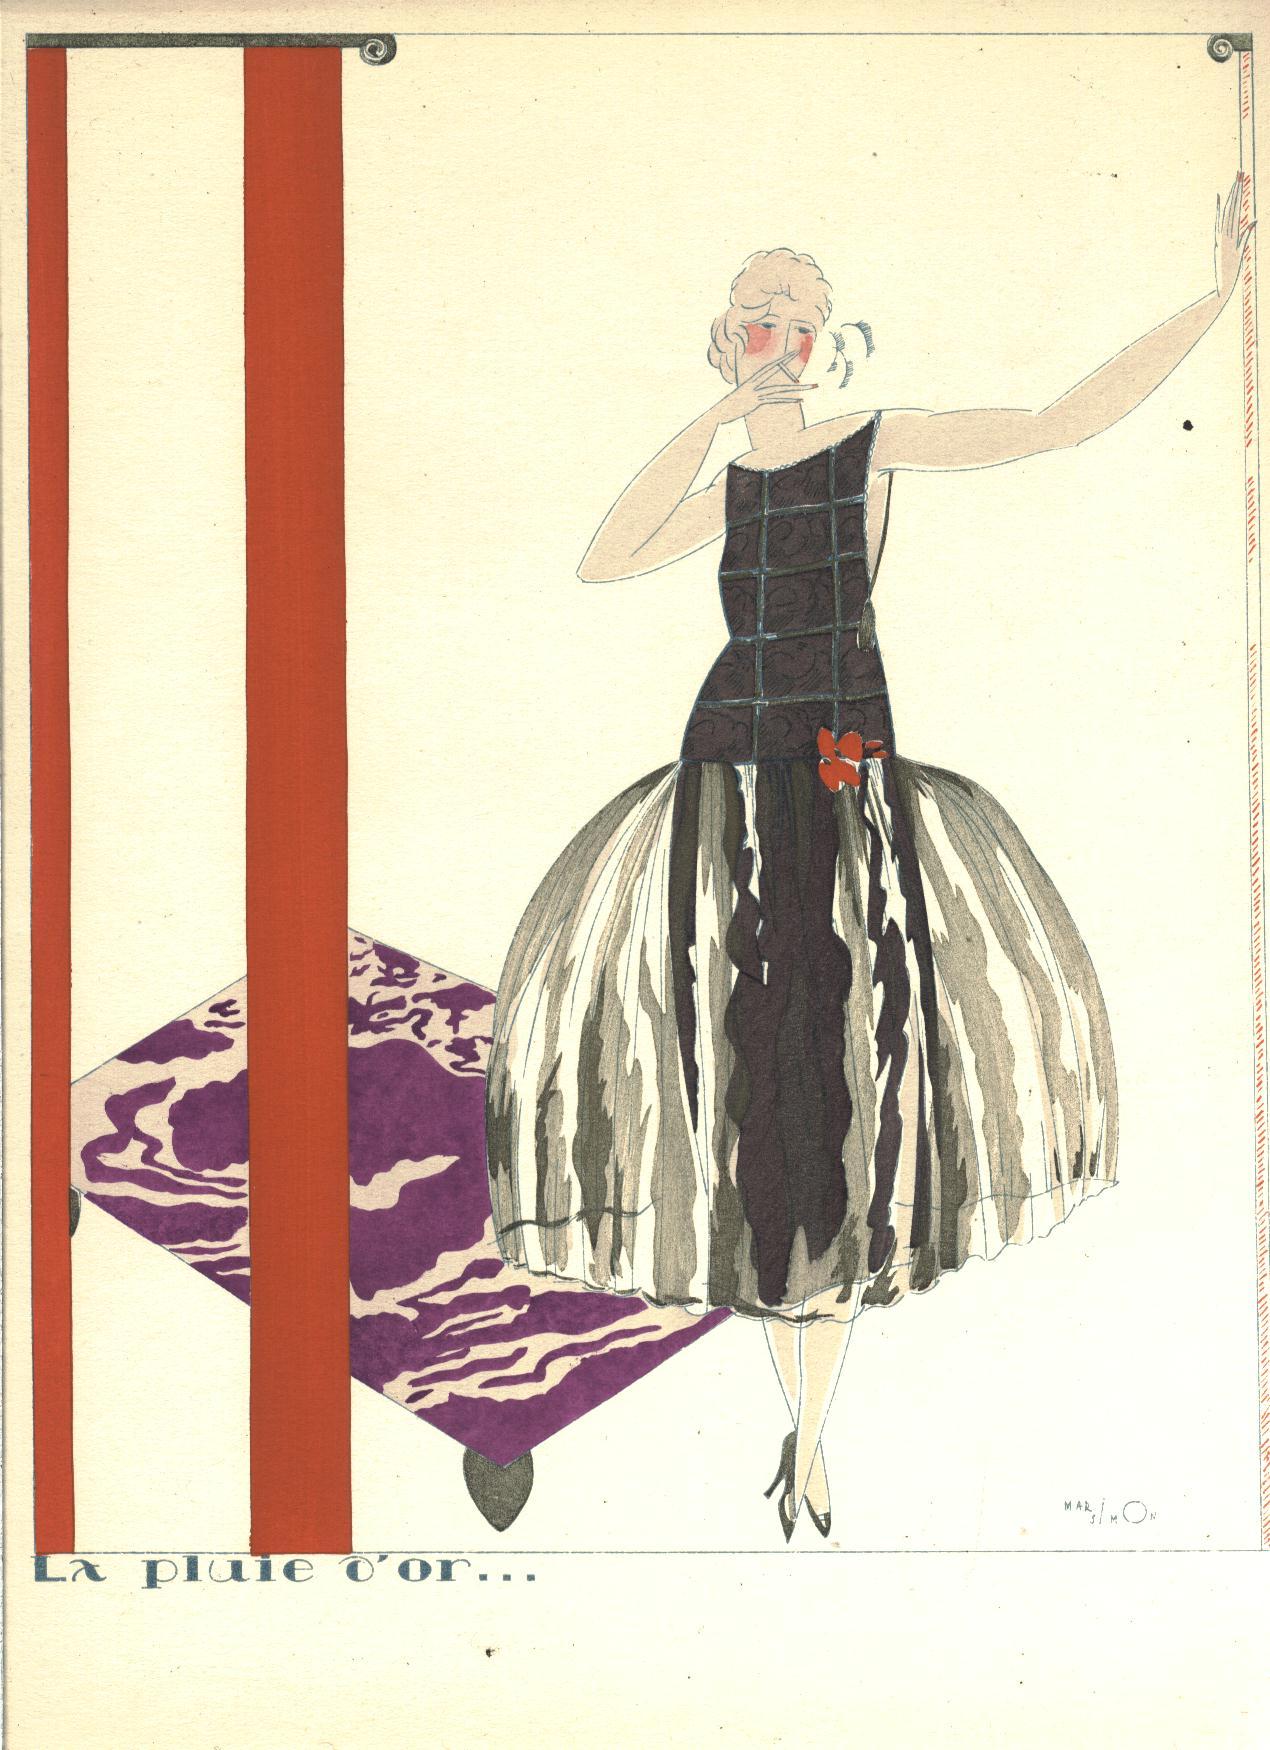 1920 art deco mario simon pochoir print rare in drawings for Pochoir deco